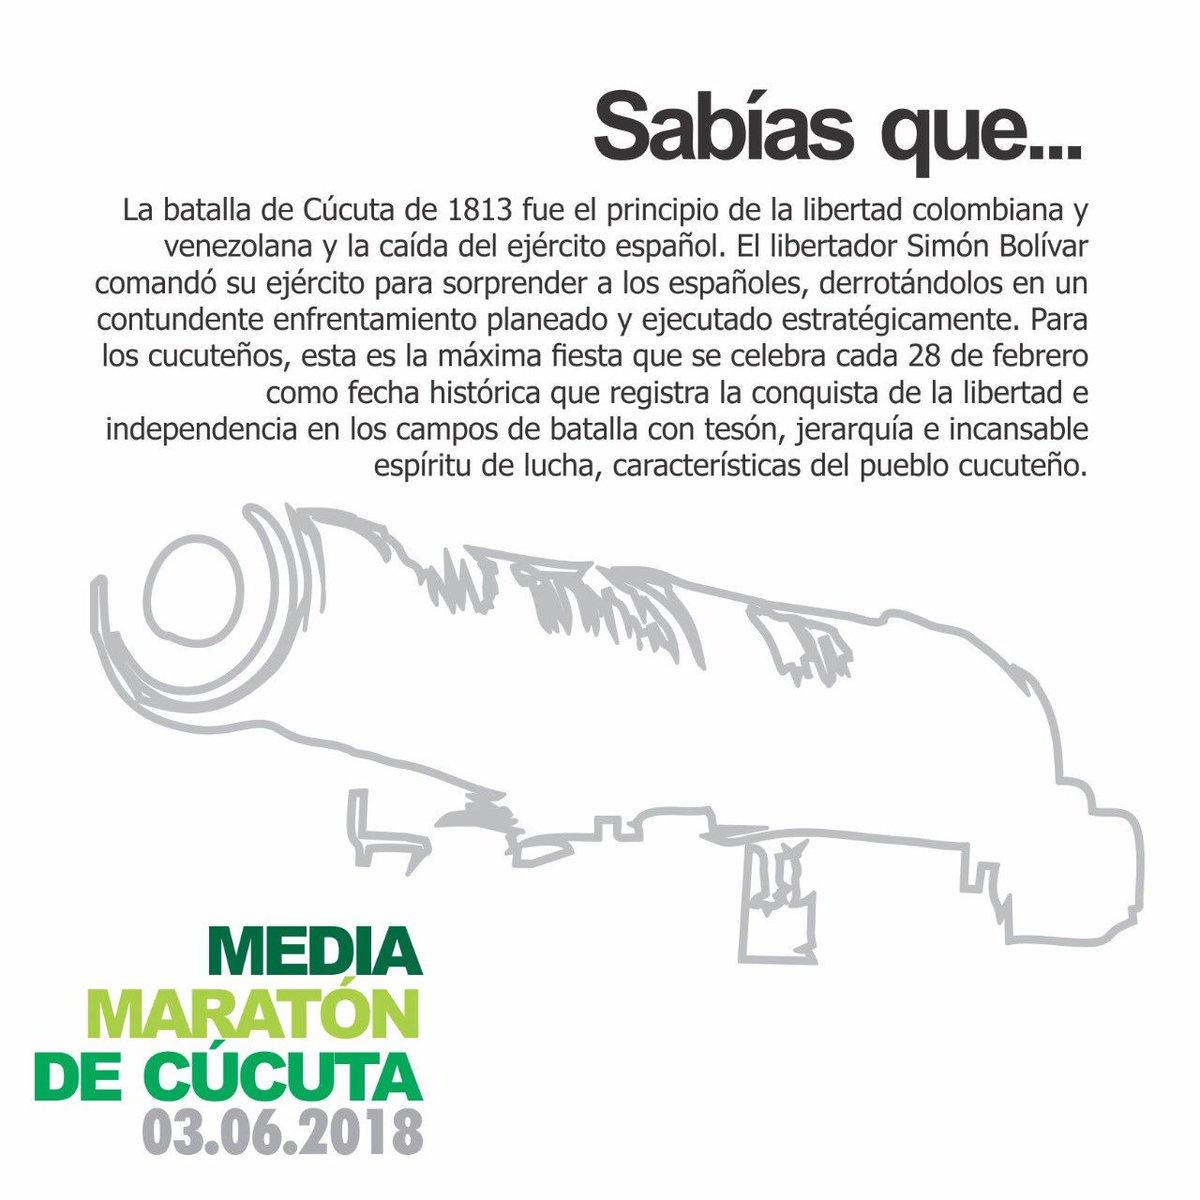 Media Maratón Cúcuta on Twitter: \